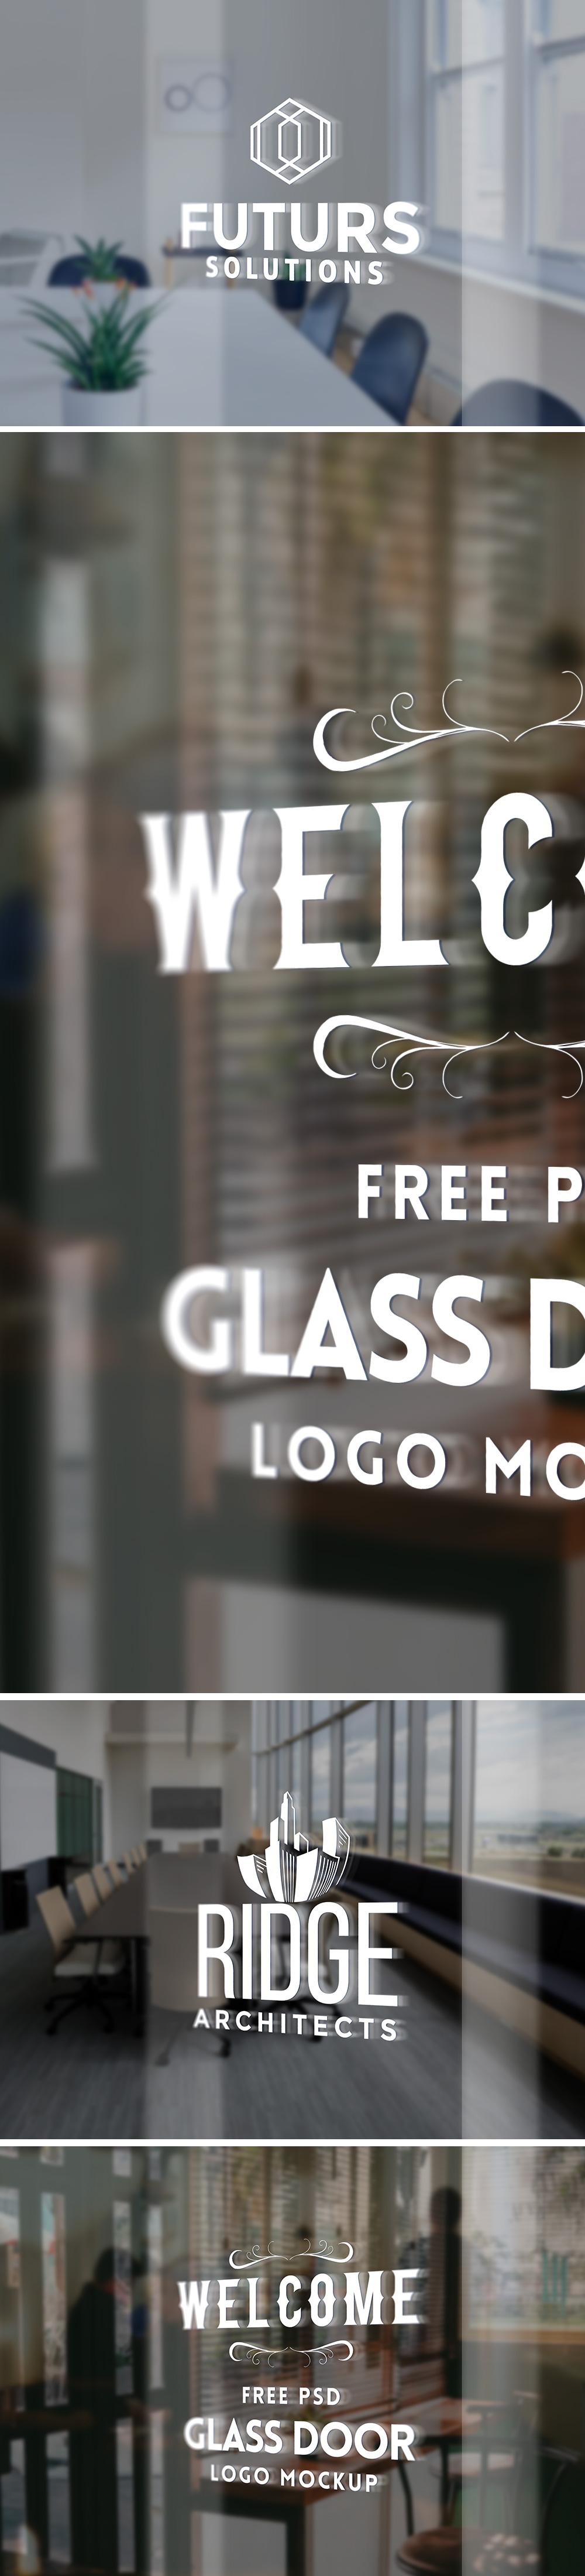 Glass Door Logo Mockup PSD